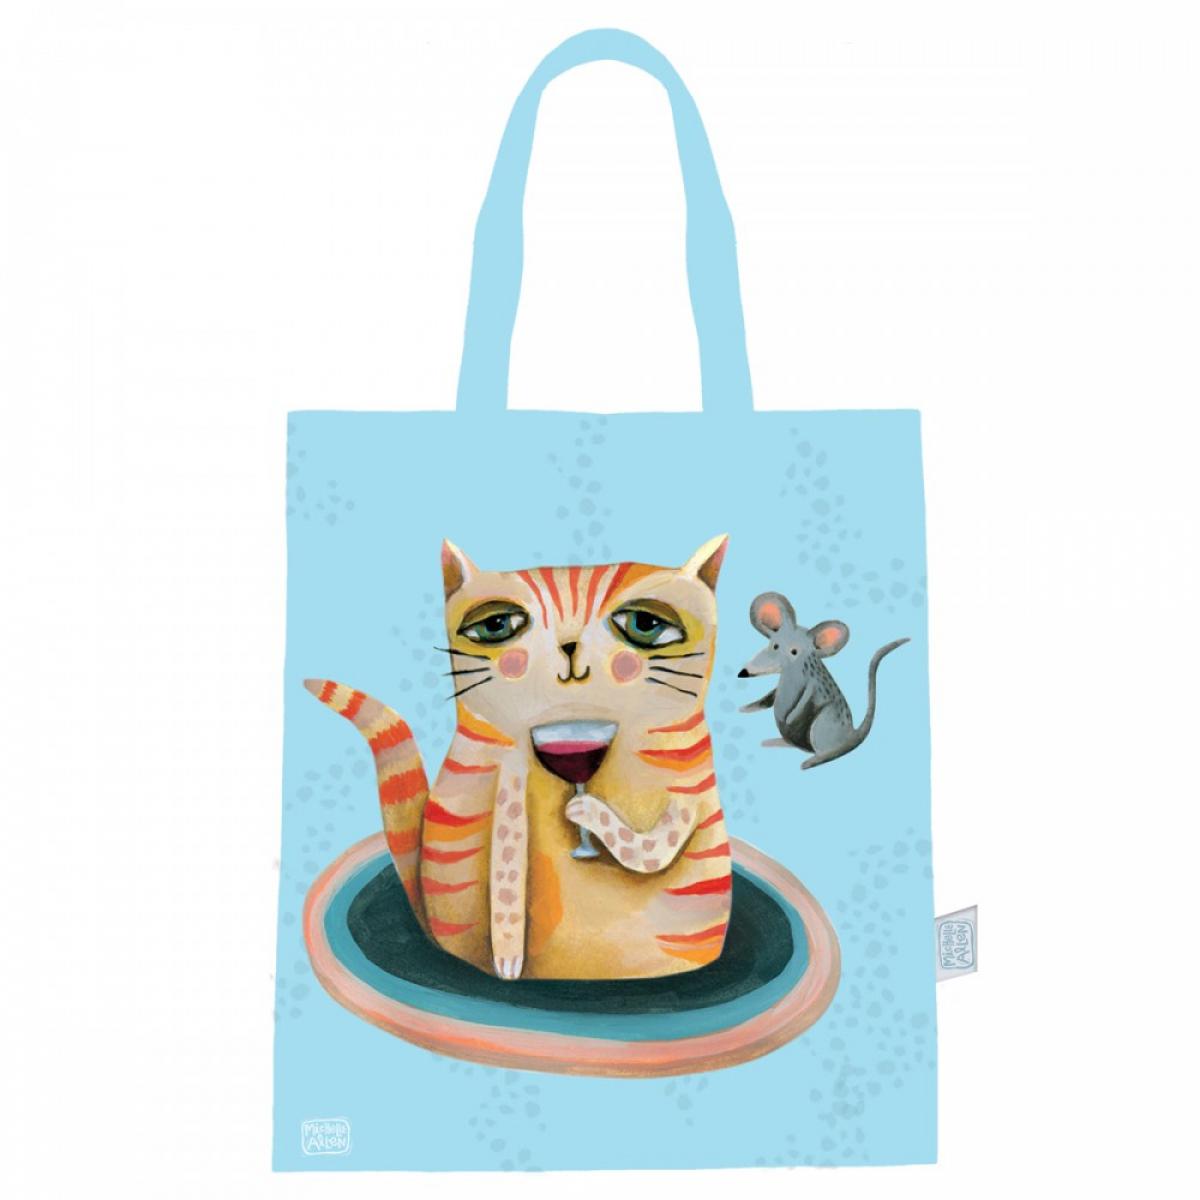 Sac coton / tote bag \'Allen Designs\' bleu (chat) - 44x38 cm - [A1989]